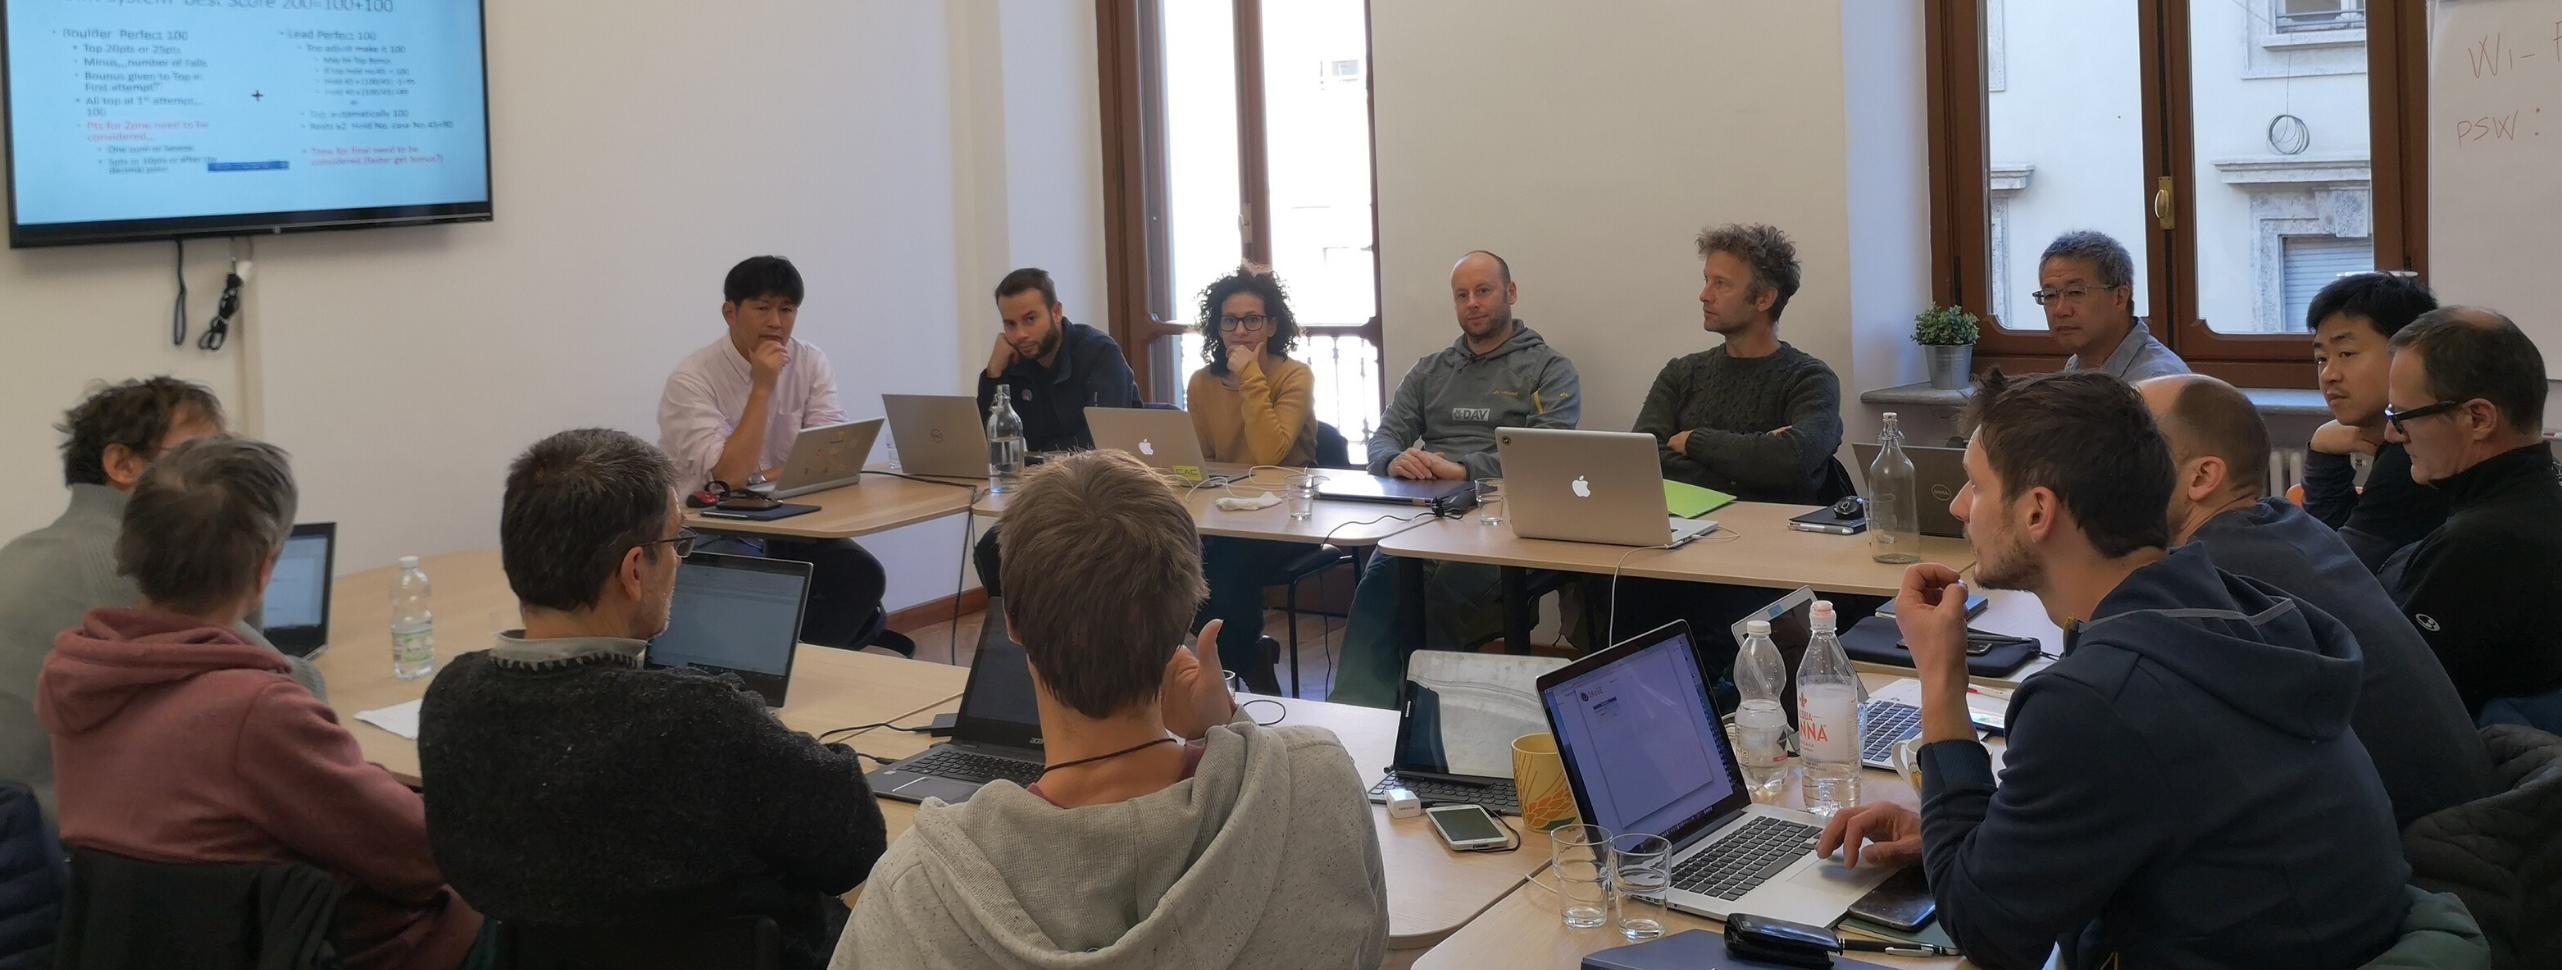 IFSC SDMC Meeting 2019 Small